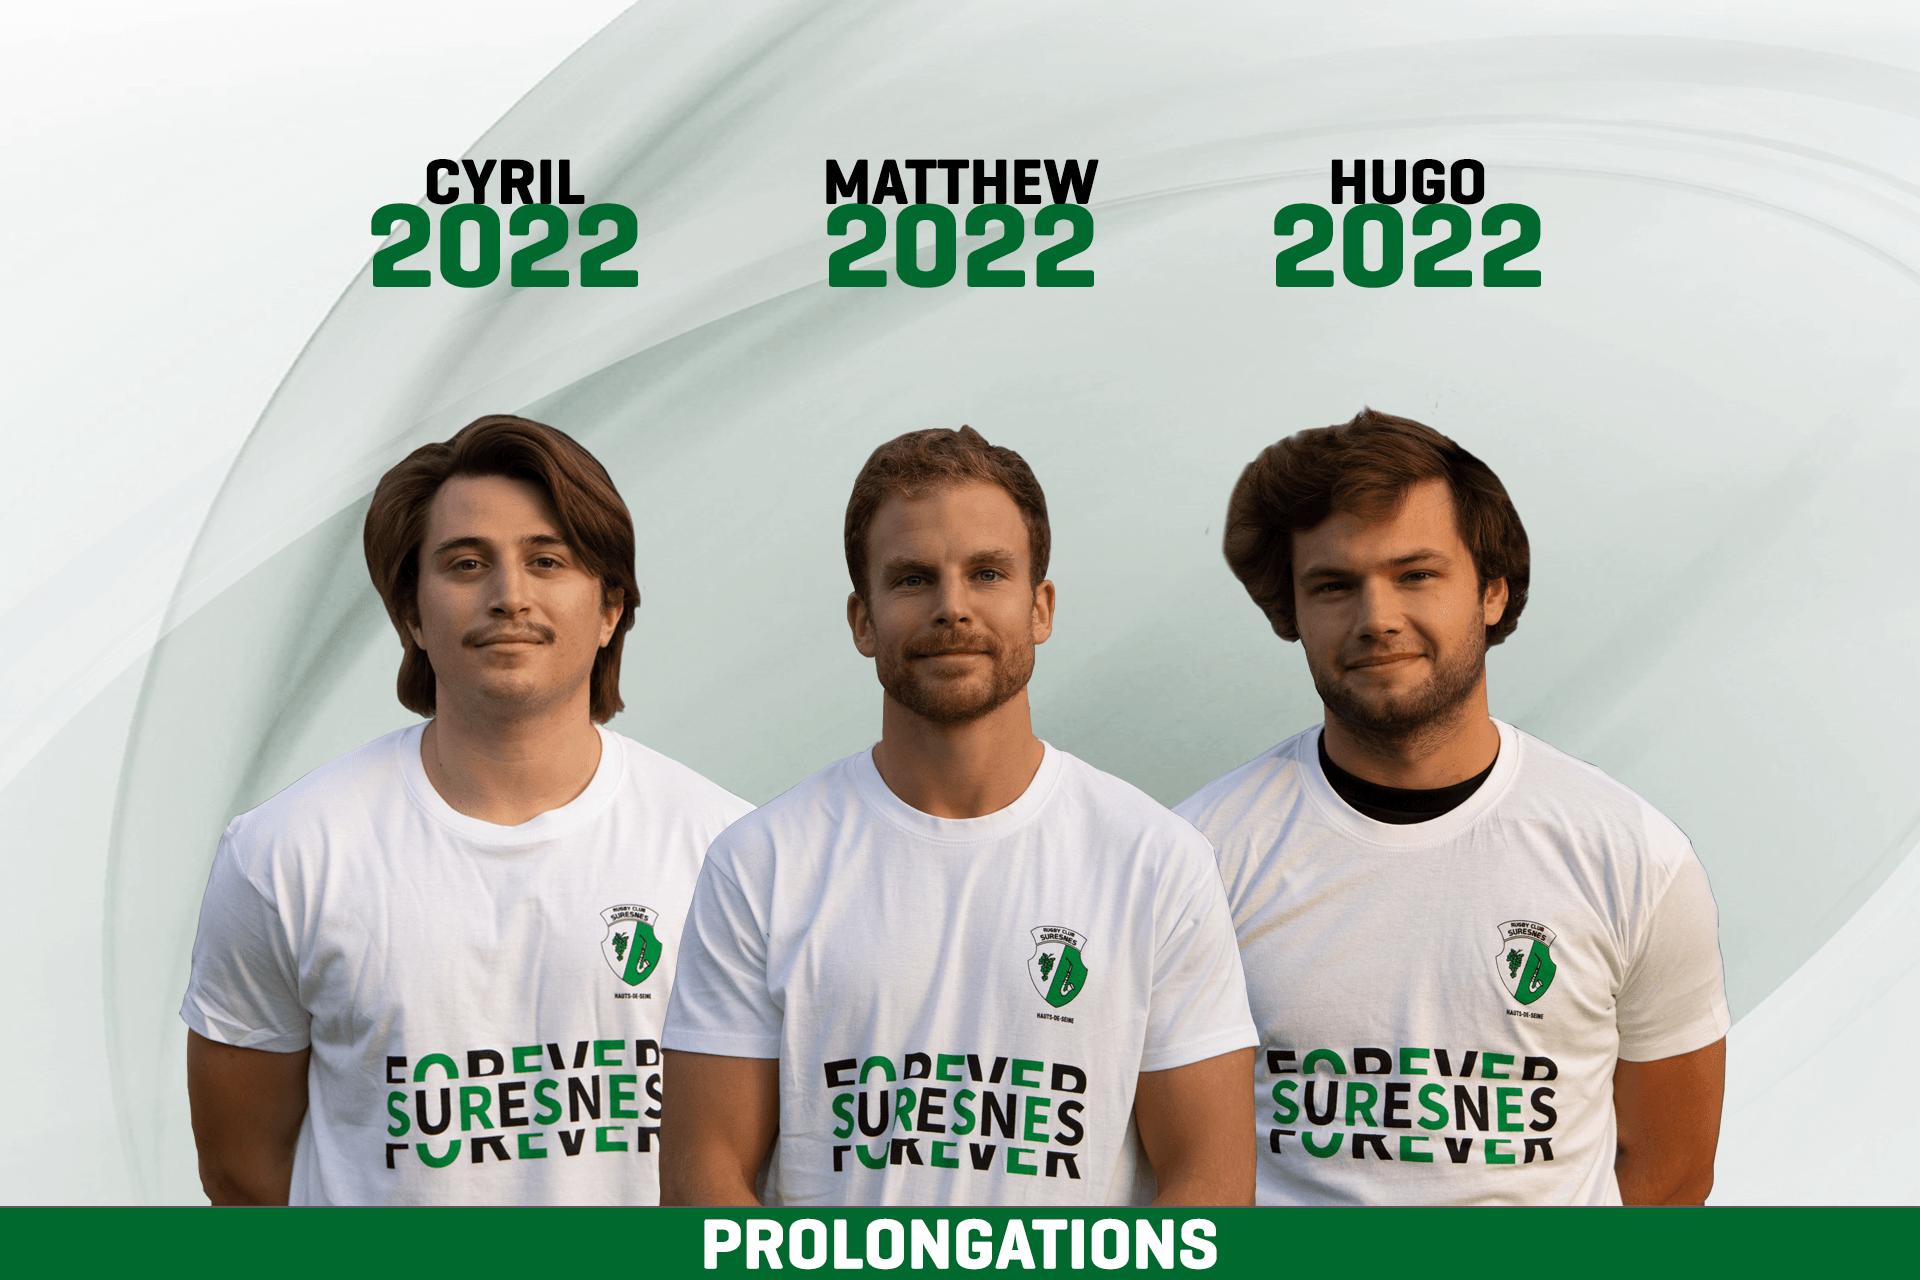 Prolongation Cyril CORNO, Matthew FORD, Hugo MALYON